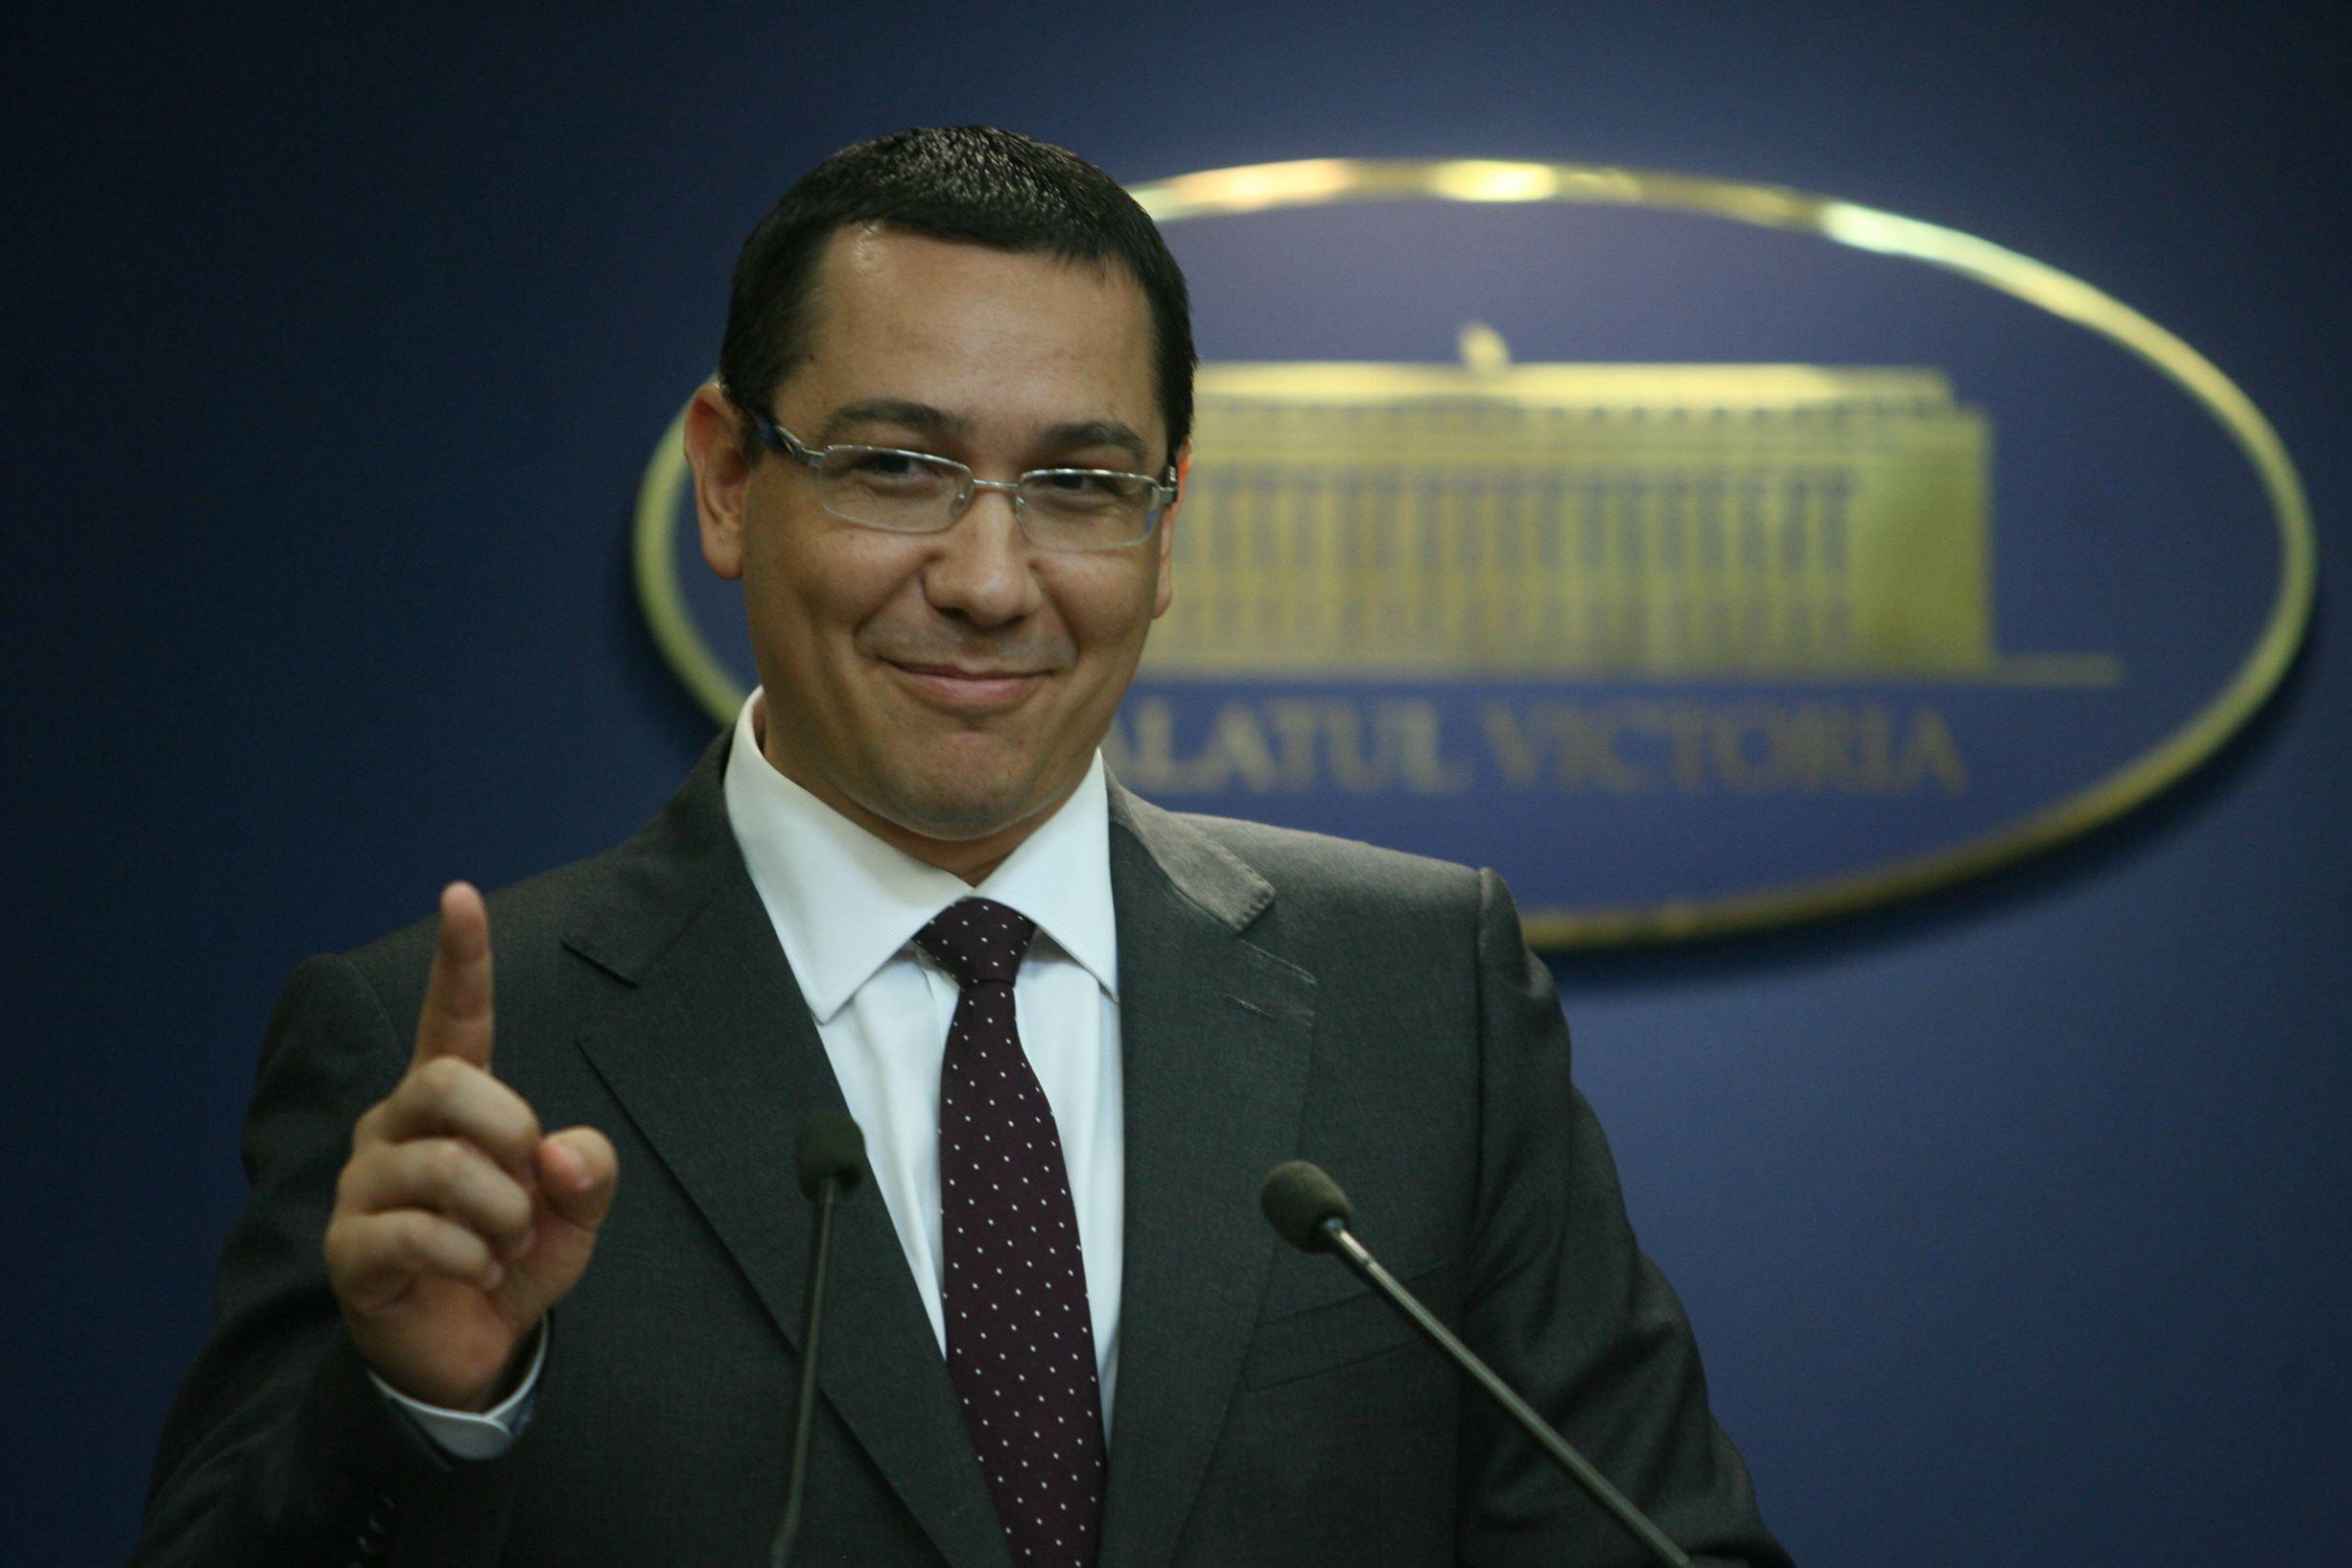 Cum vrea Ponta sa faca rost de un million de voturi